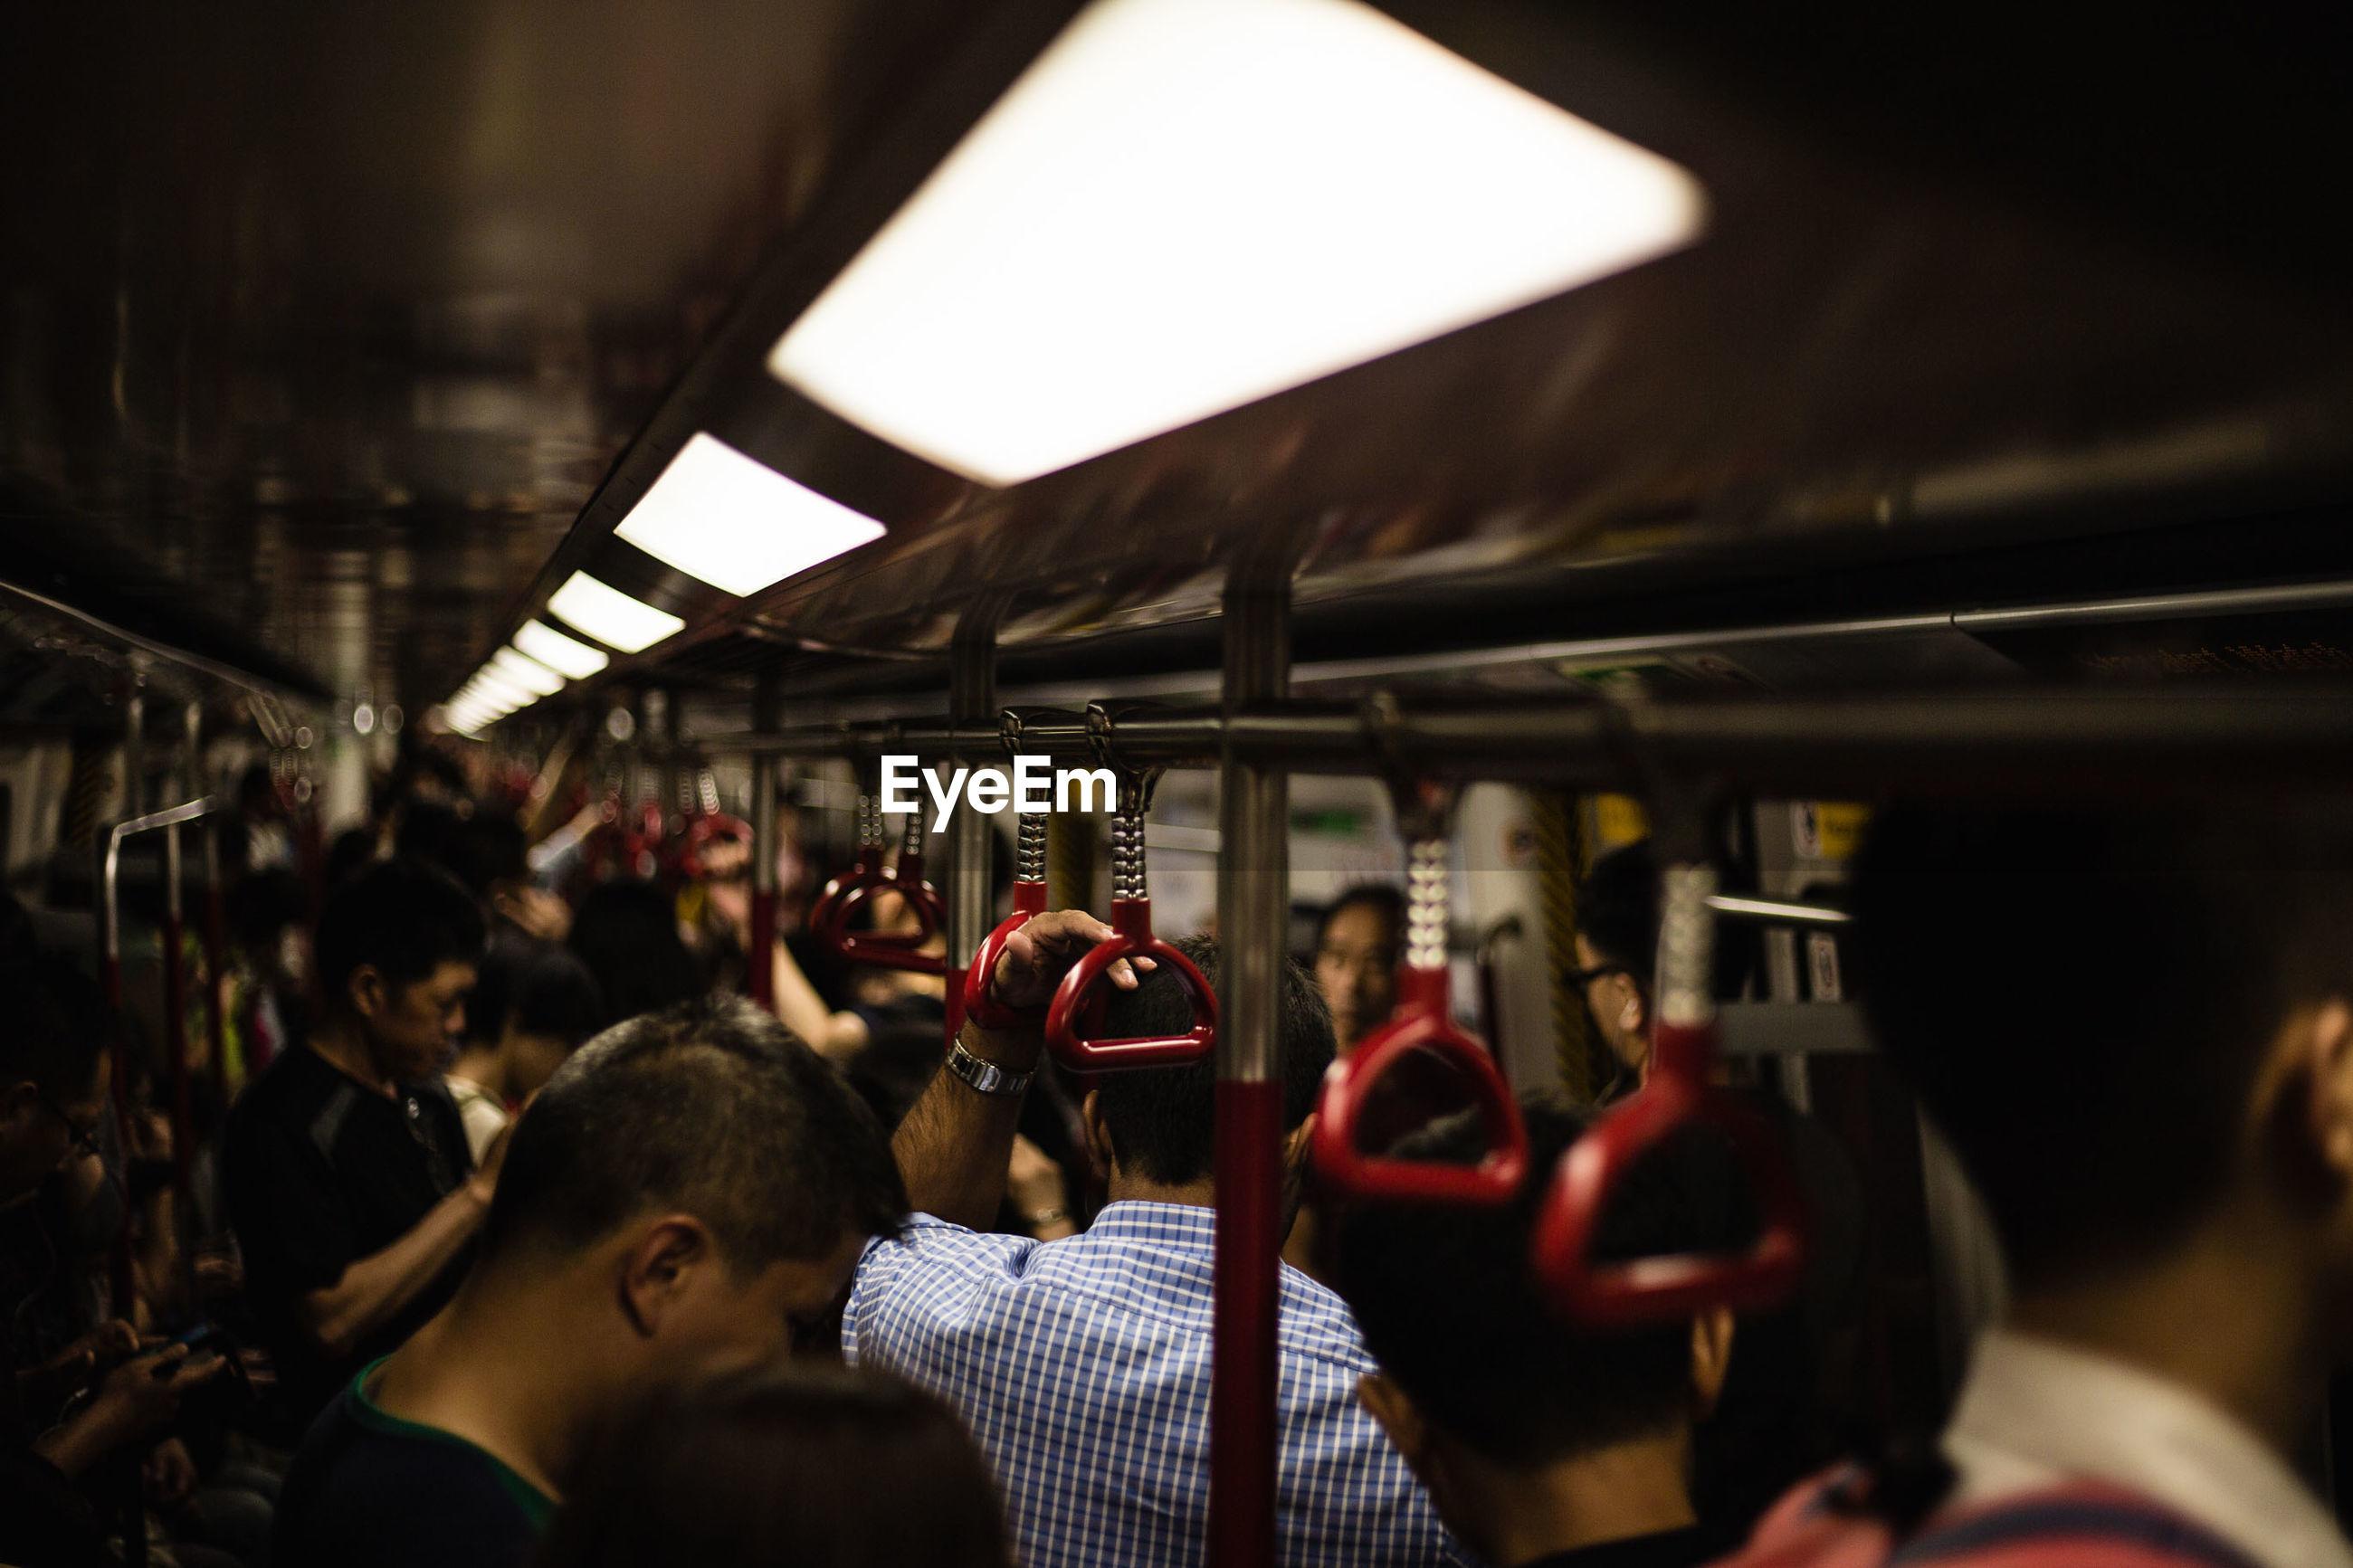 View of crowd in illuminated subway train